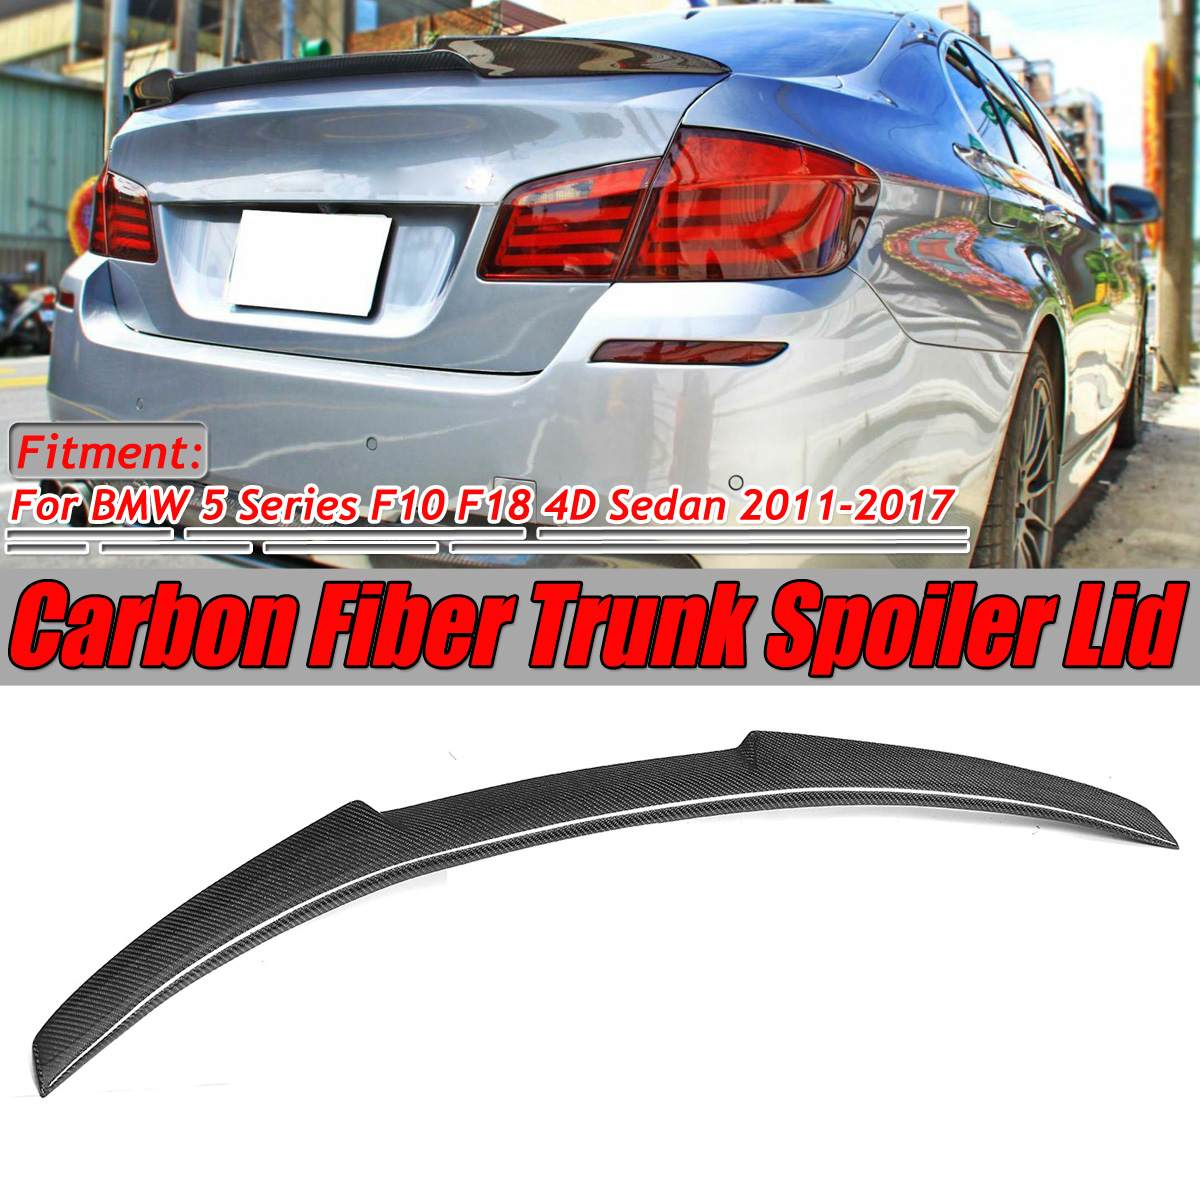 F10 F18 Heckspoiler Flügel Deckel M4 Stil Real Carbon Fiber Auto Hinten Trunk-Boot Lip Spoiler Flügel Für BMW 5 serie F10 F18 2011-2017